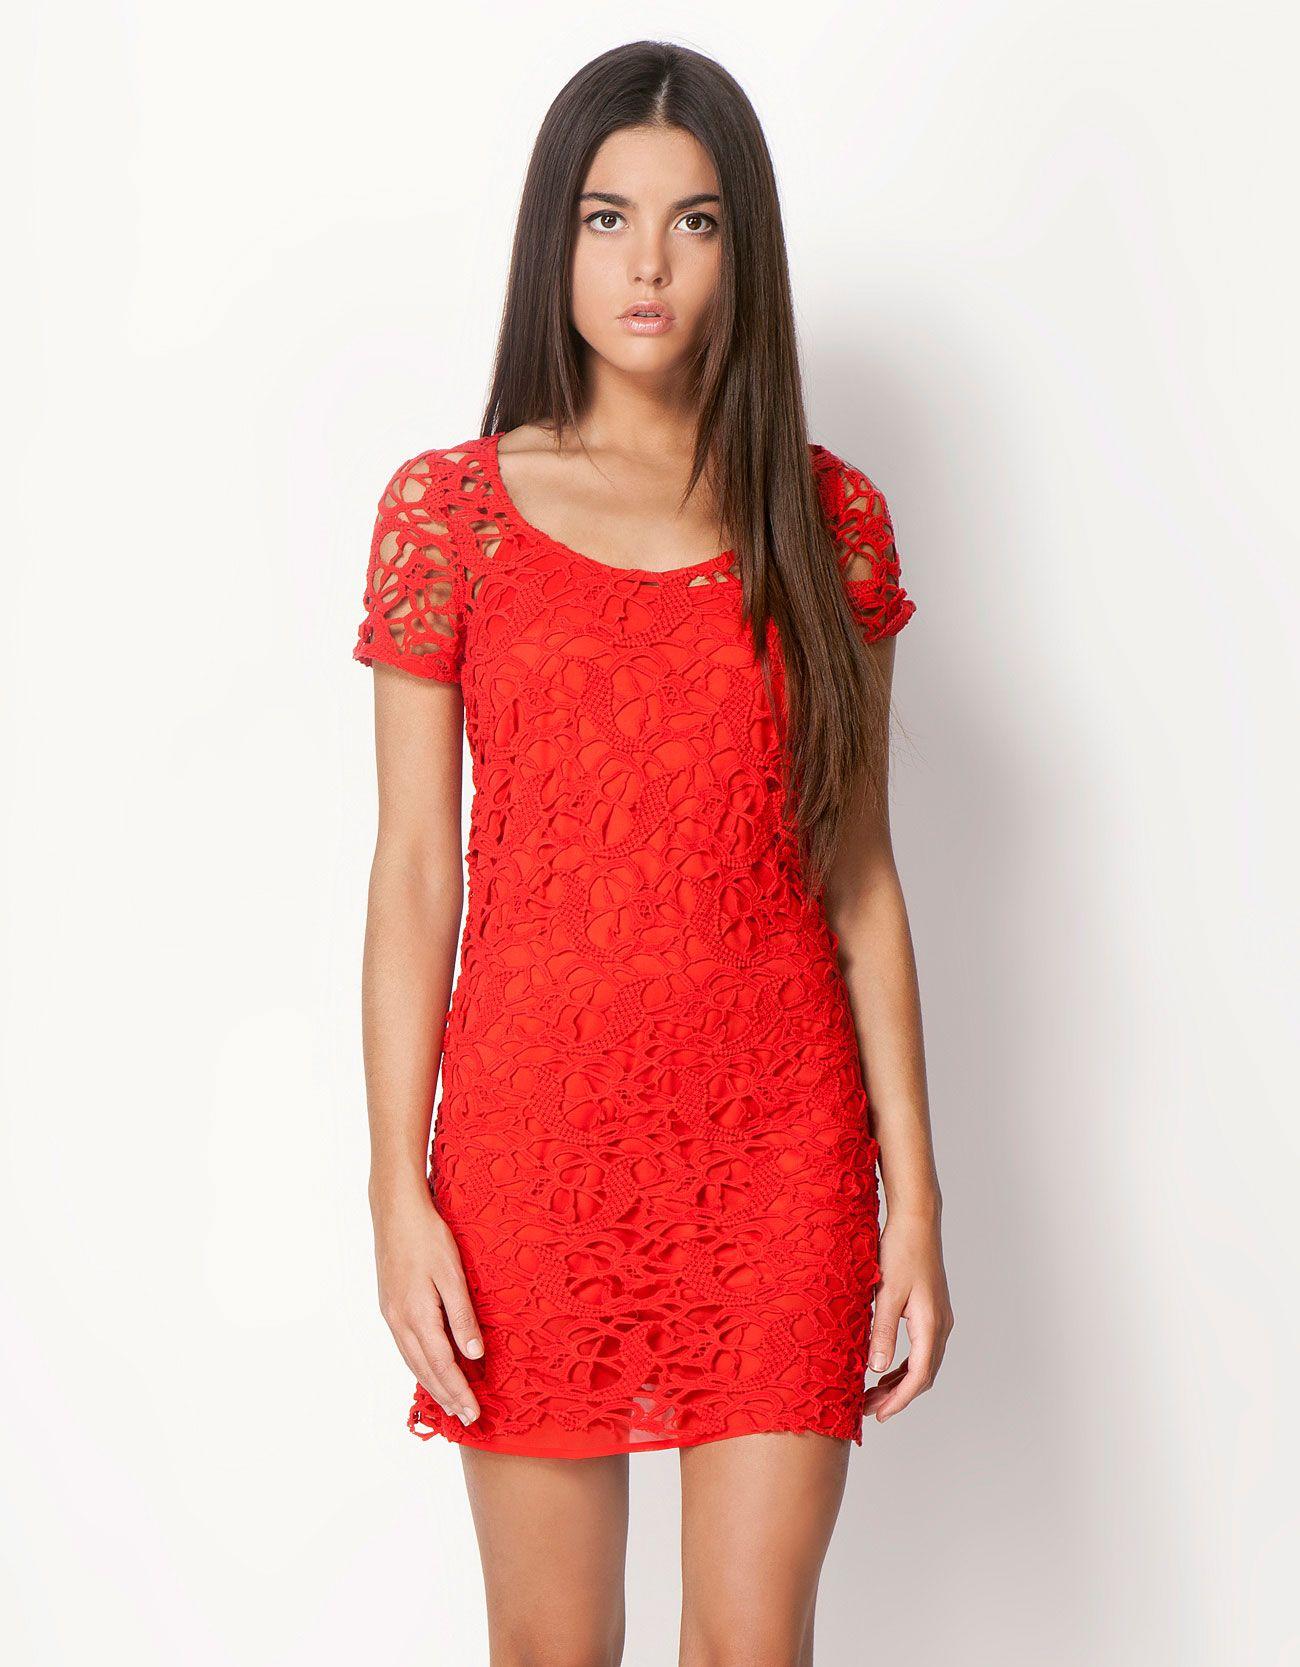 Crochet dress singapore style